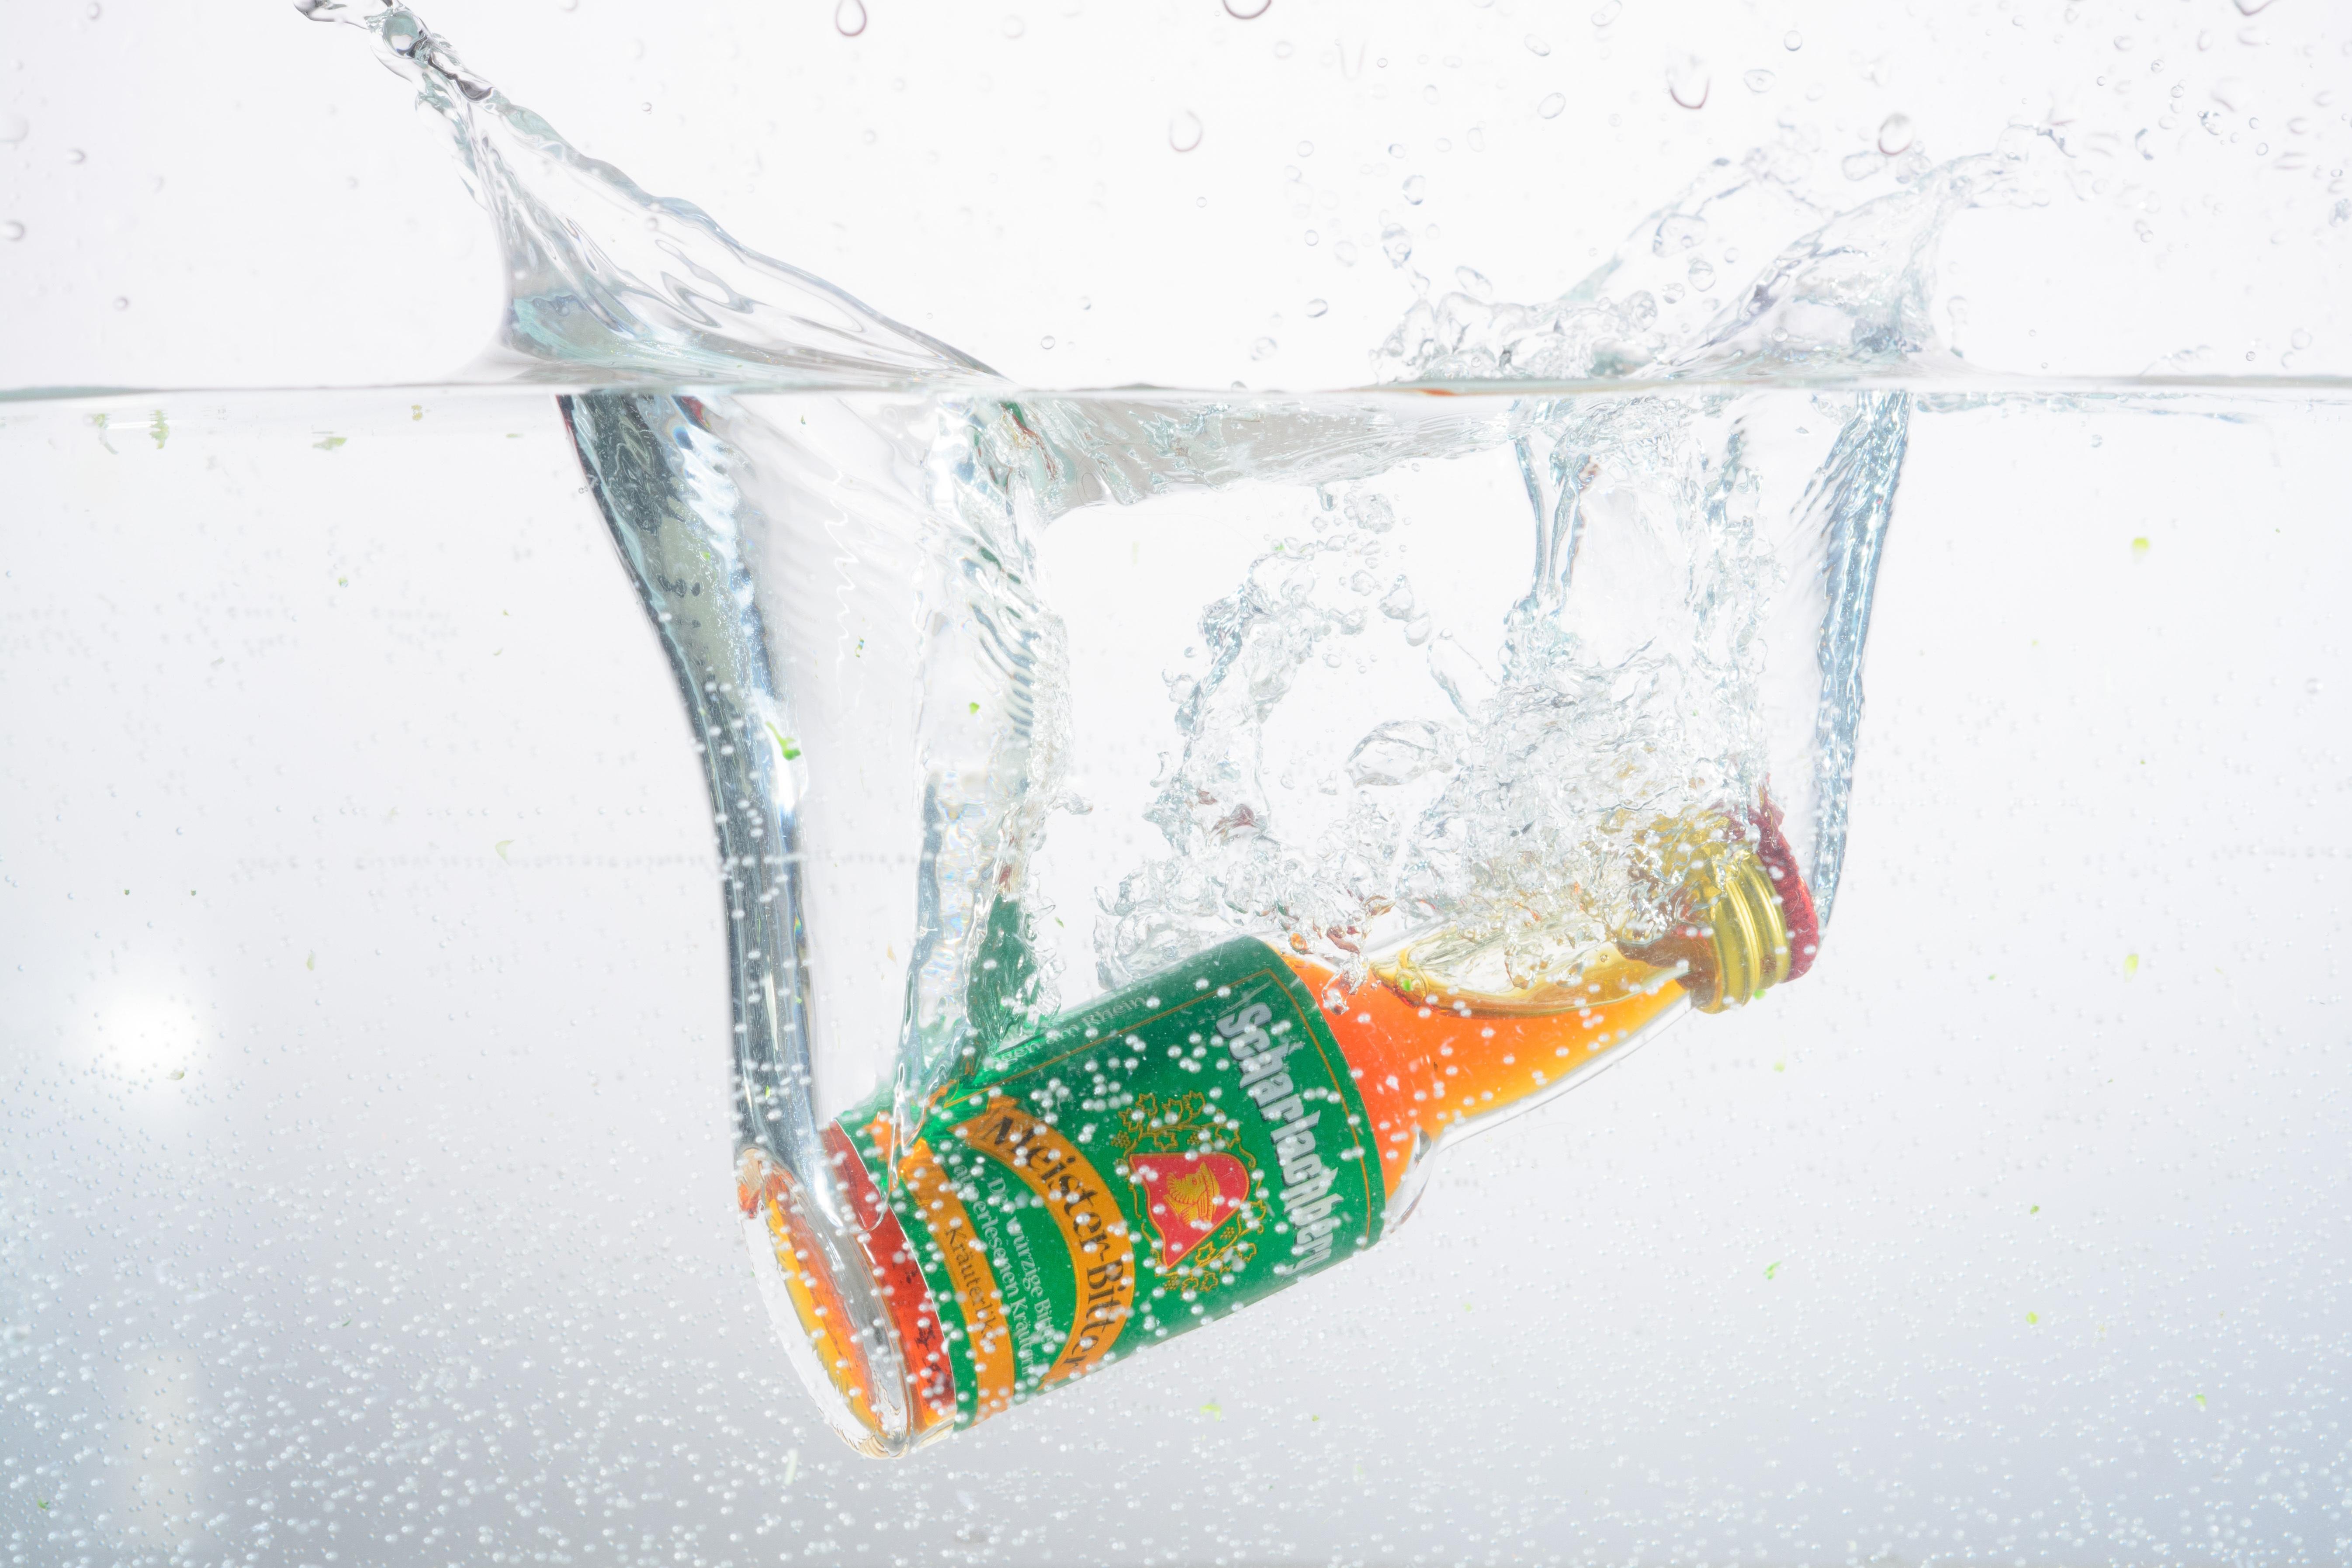 Gambar Gelombang Kaca Es Semprot Botol Gerakan